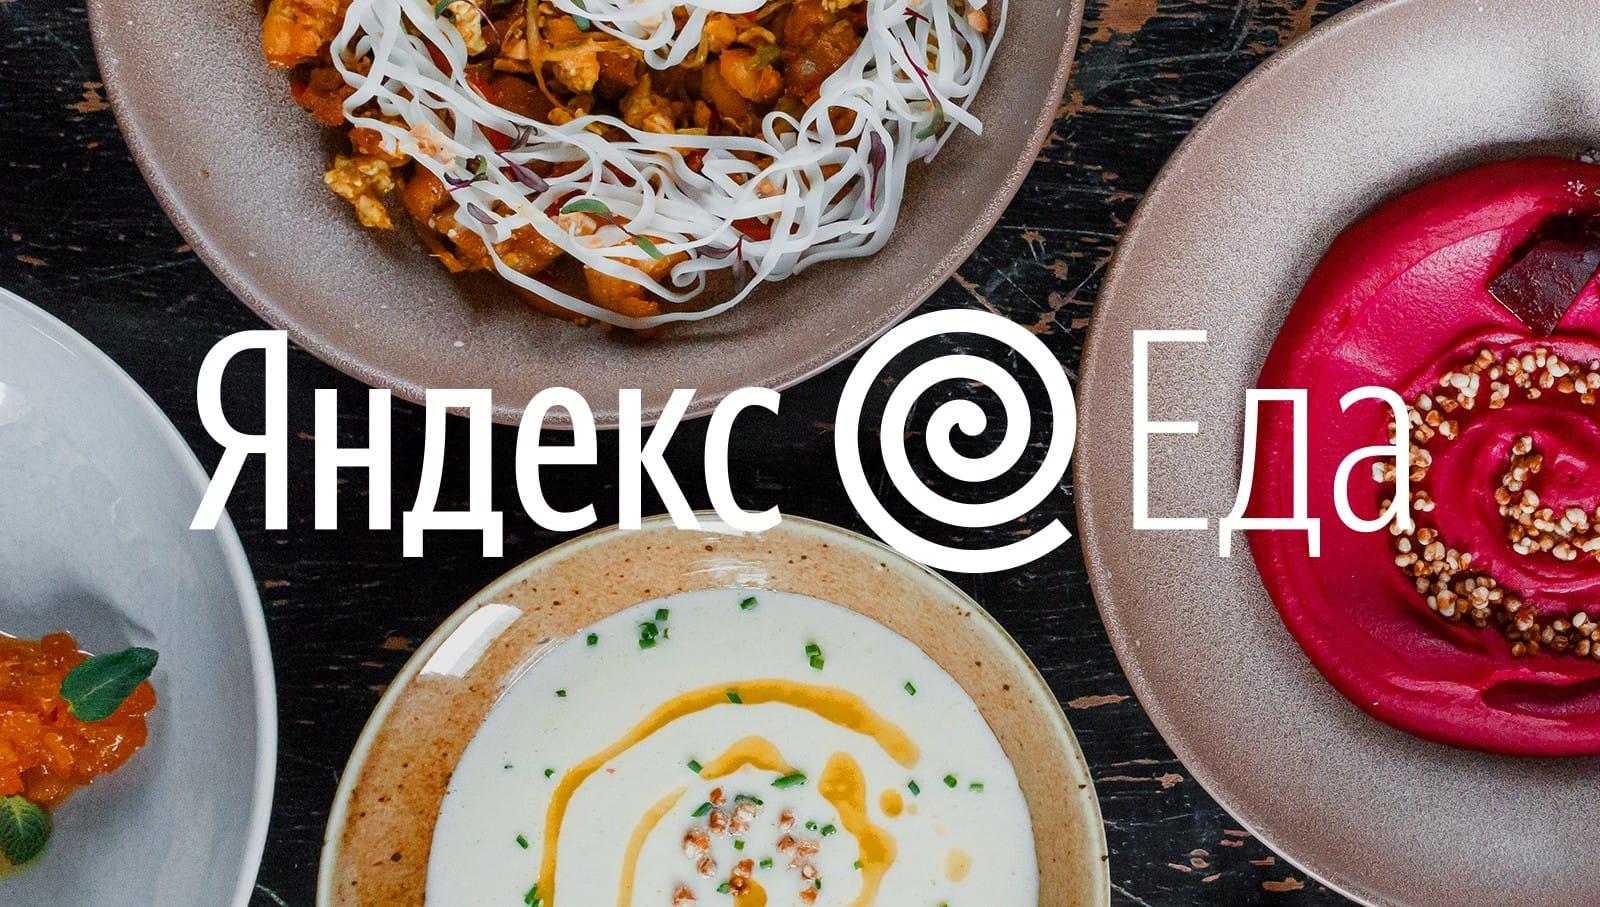 Сервис «Яндекс. Еда» будет запущен вПетербурге игородах-миллионниках